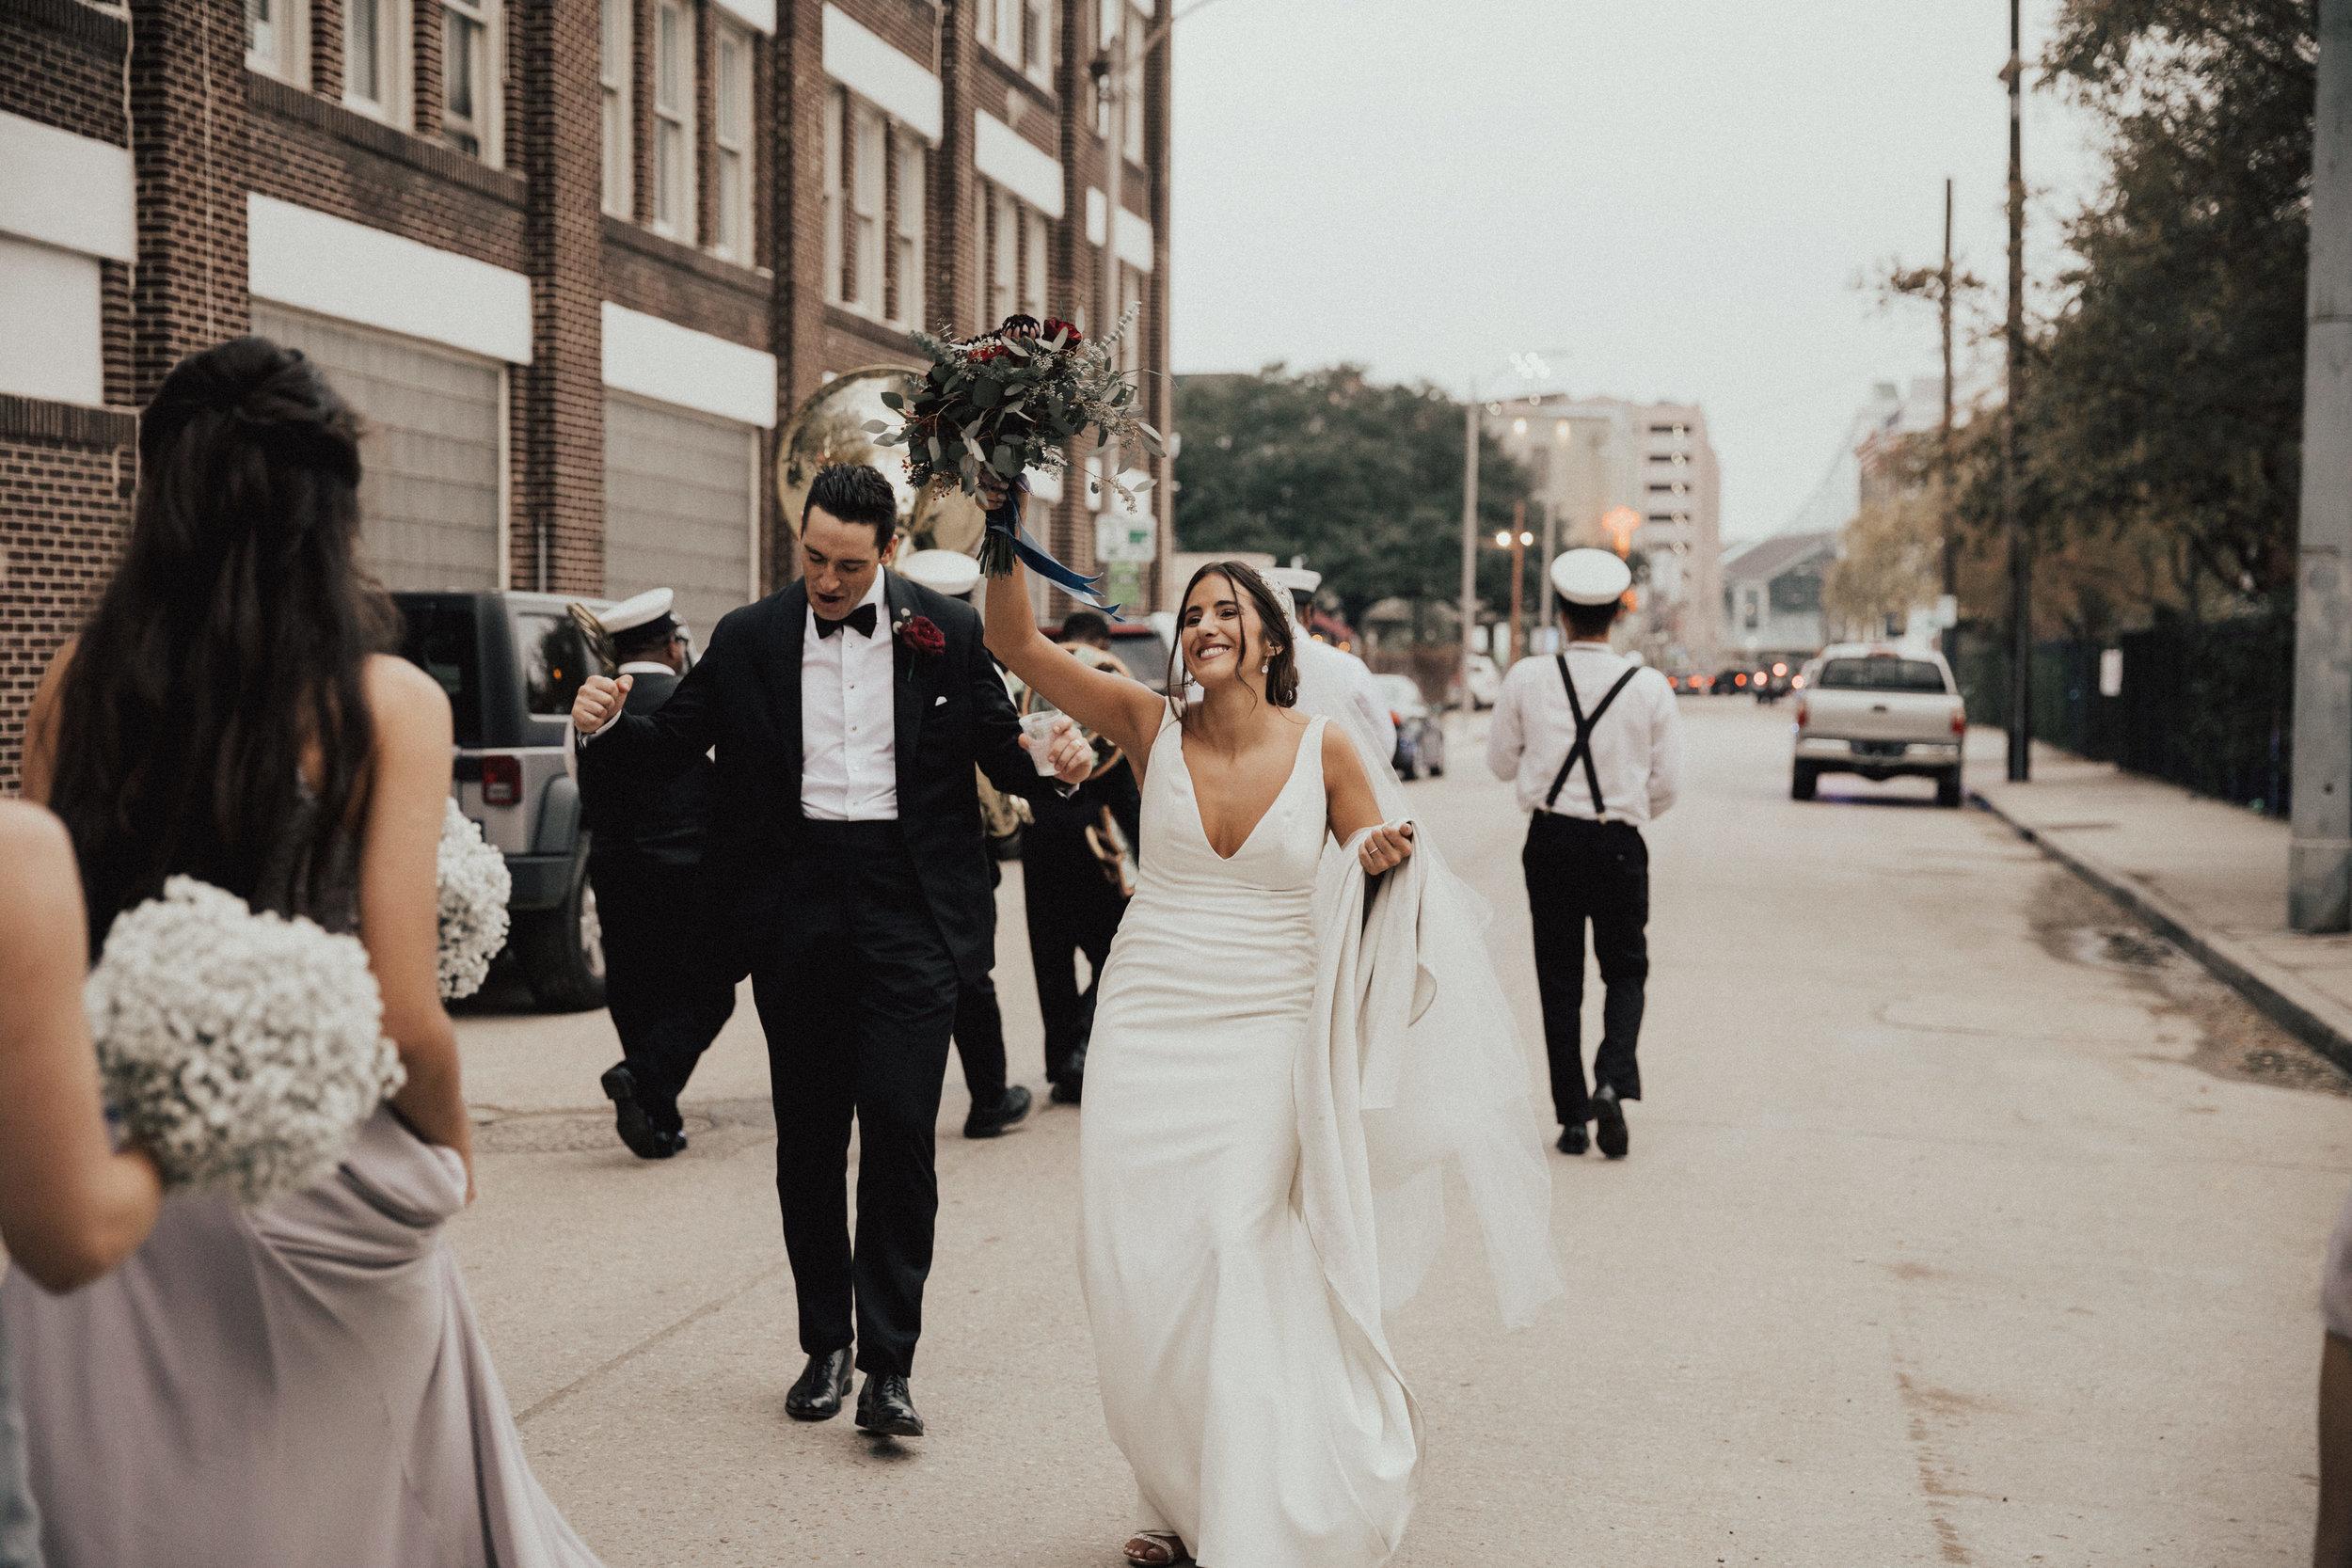 magners wedding (83 of 145).jpg